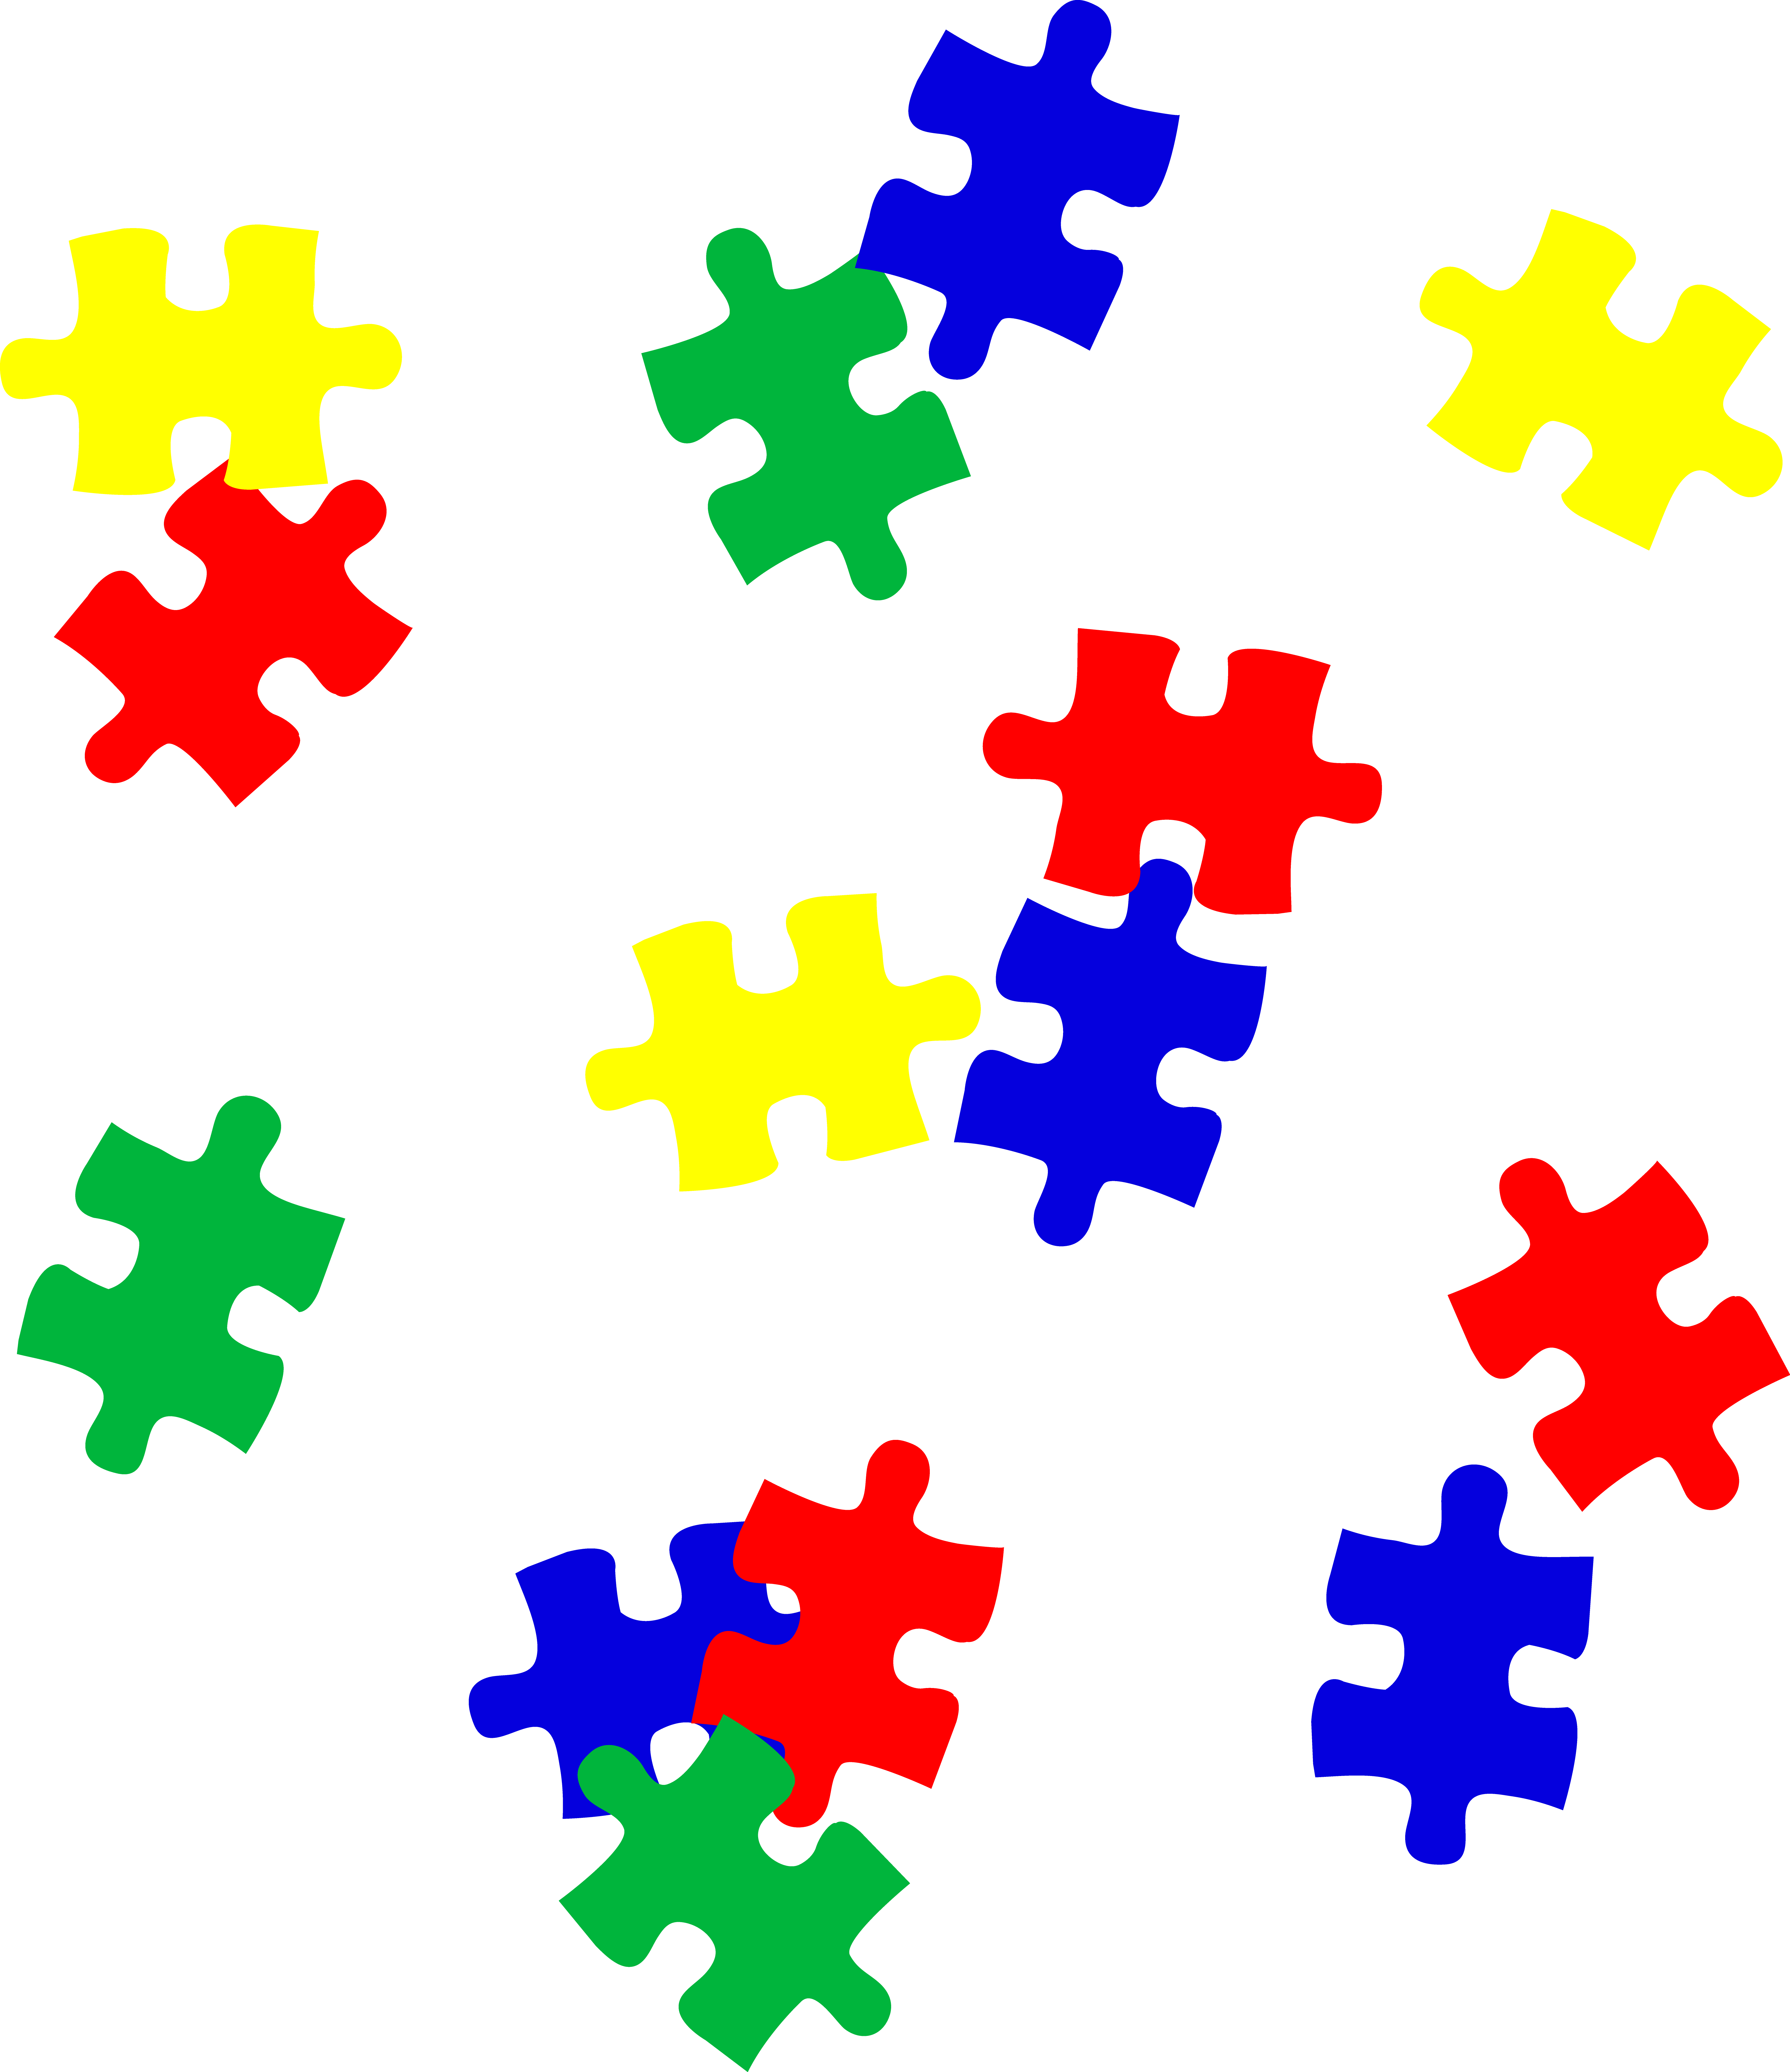 Puzzle clip art free. Diversity clipart powerpoint background